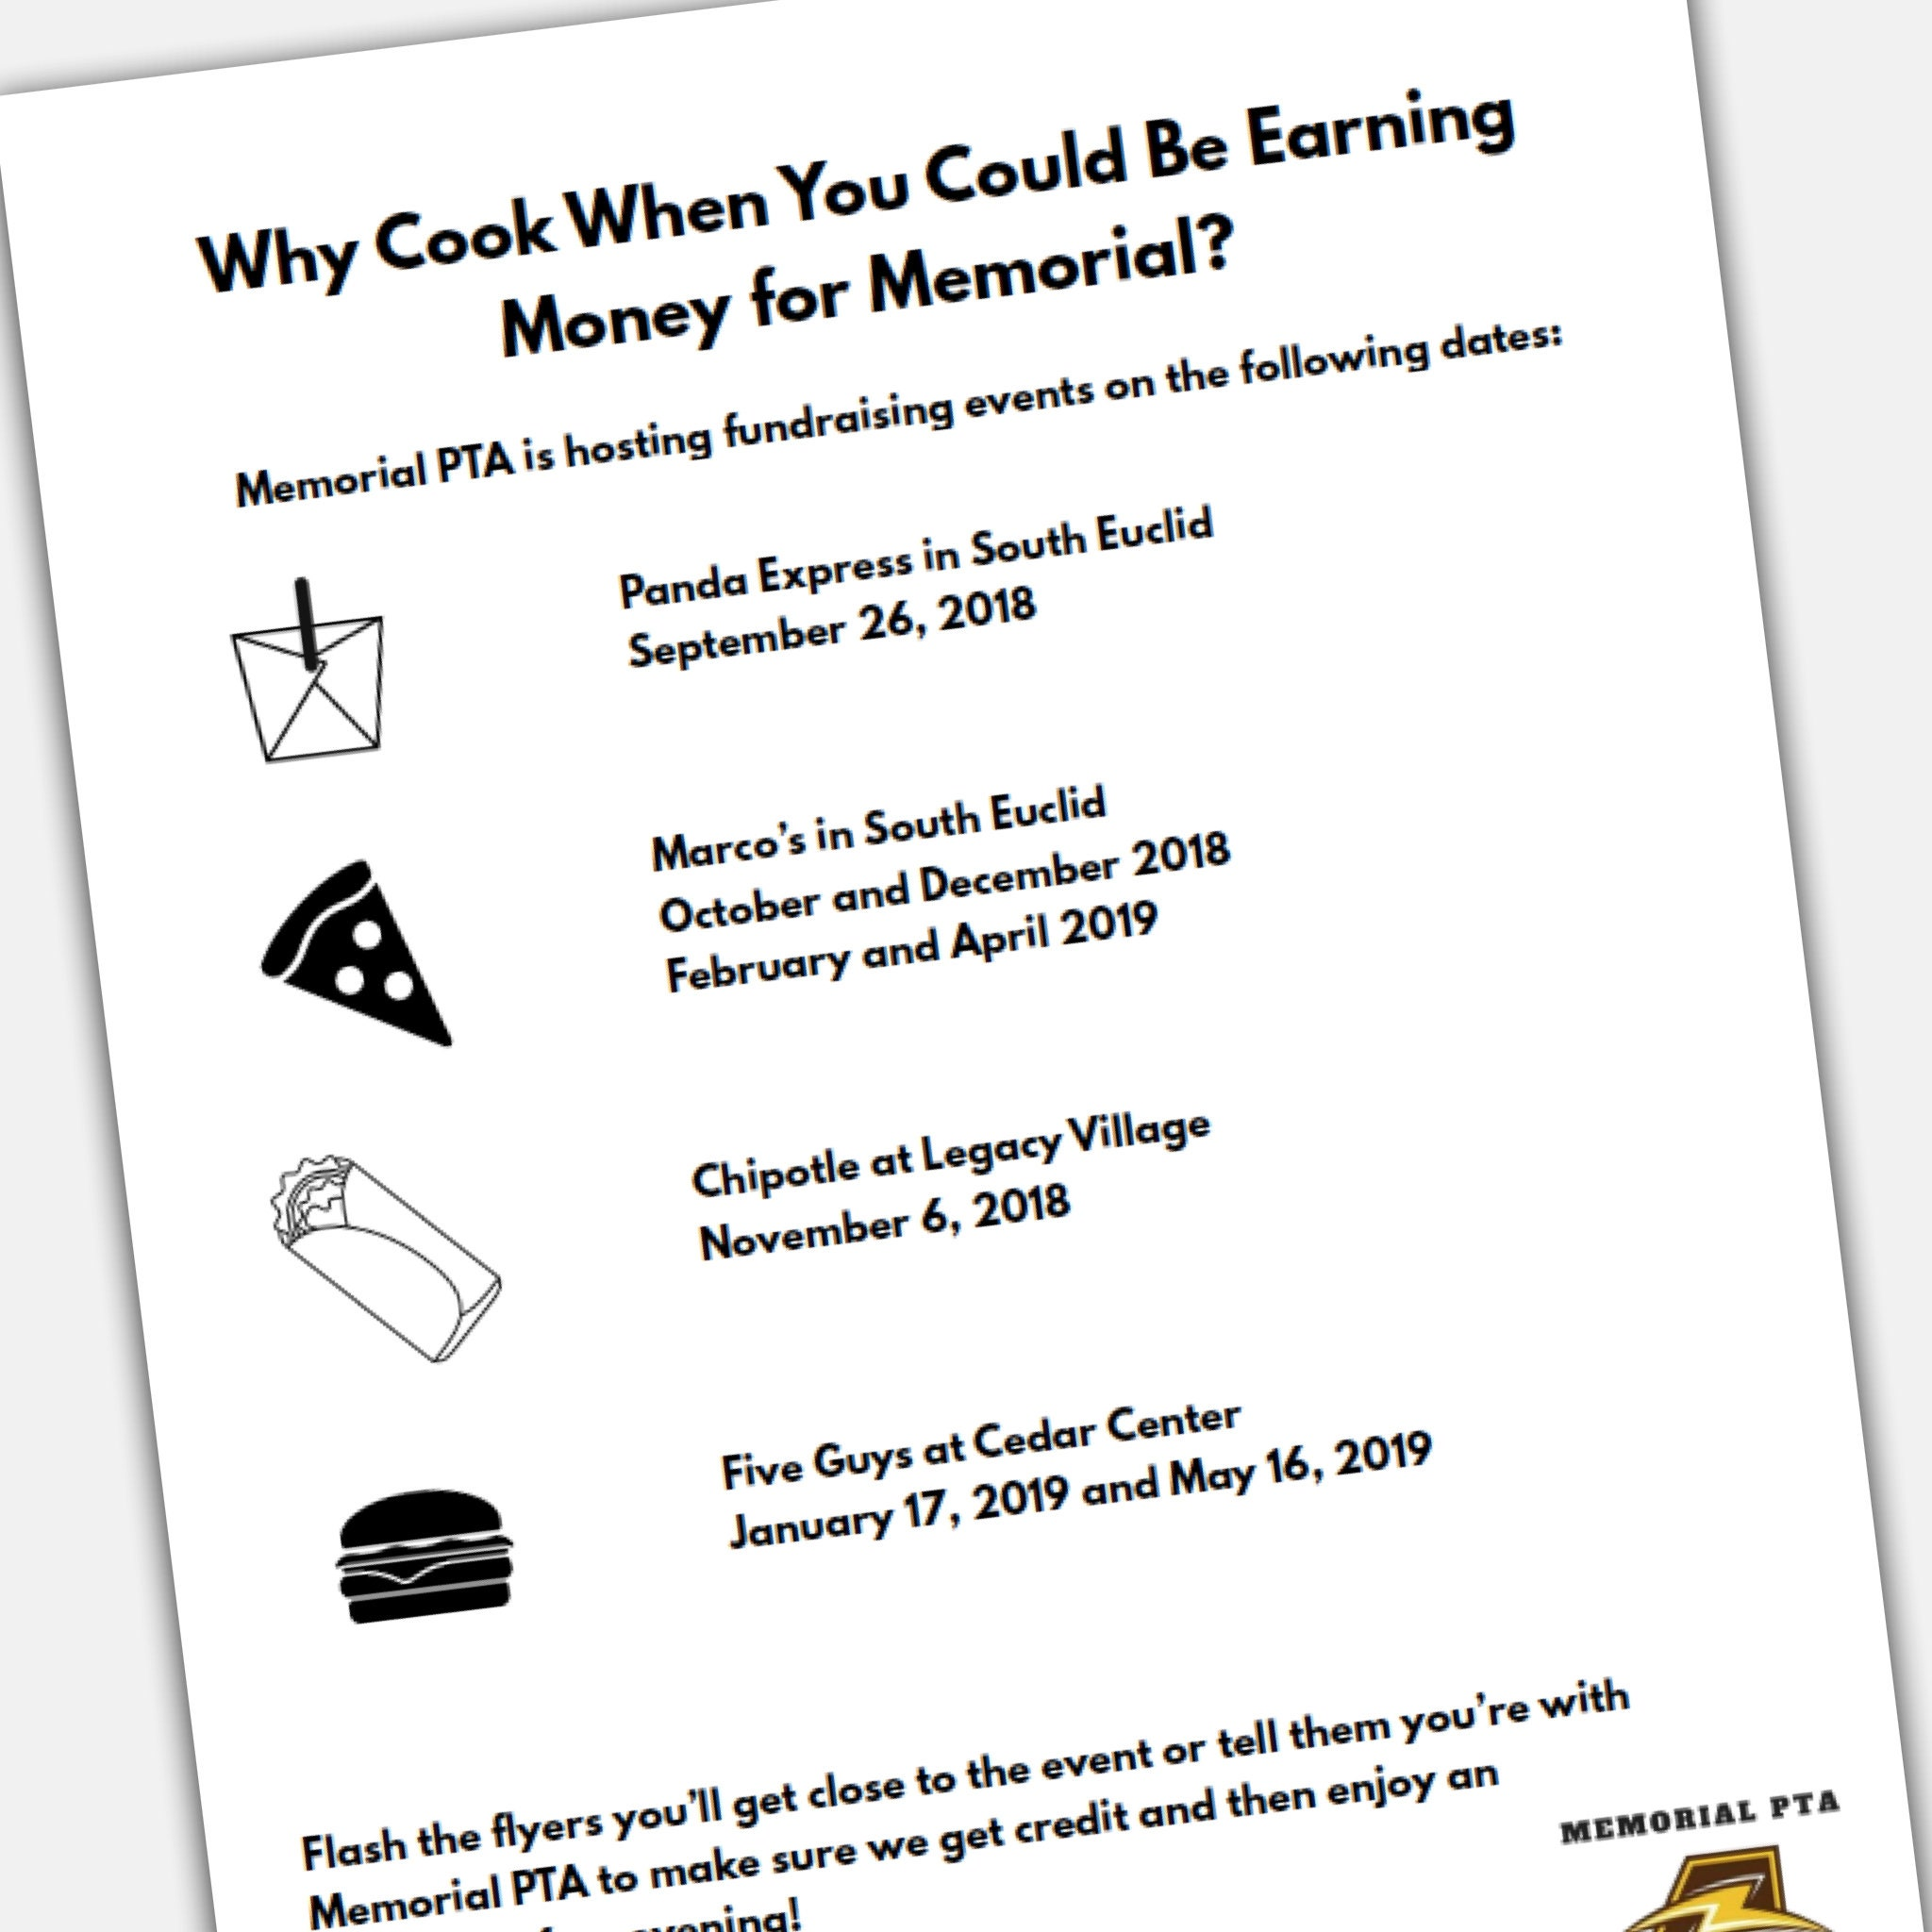 Restaurant Fundraising Night Flyer Template for PTA / PTO : Fully Editable  Flyer Template